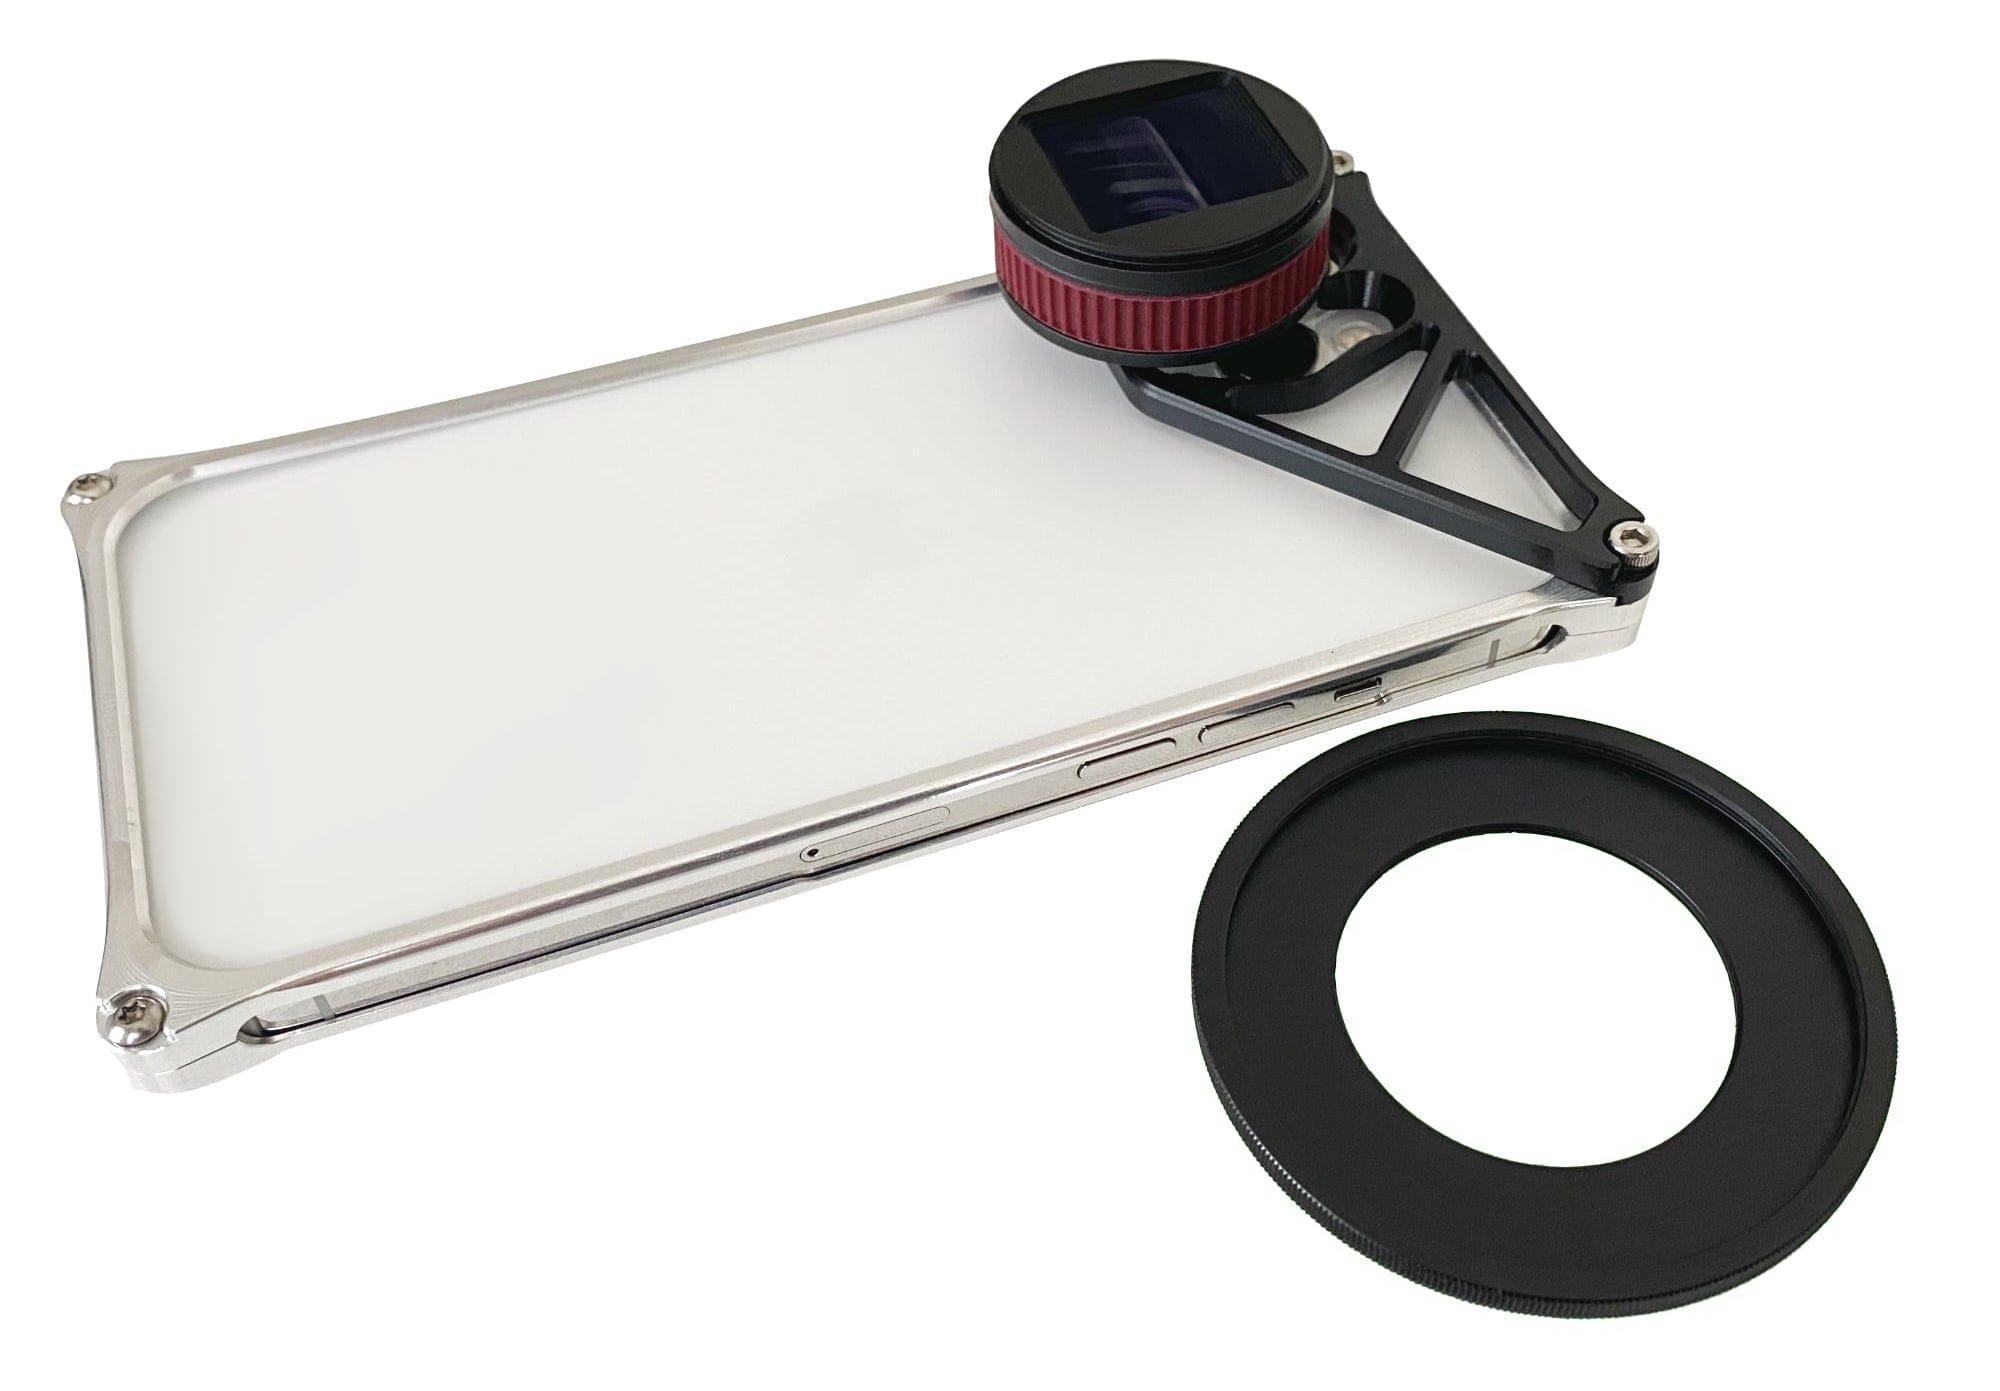 iPhone 12 Pro/Max用Solid Bumperに取り付けられるアタッチメントレンズ「USHADOW X1」用マウント発売